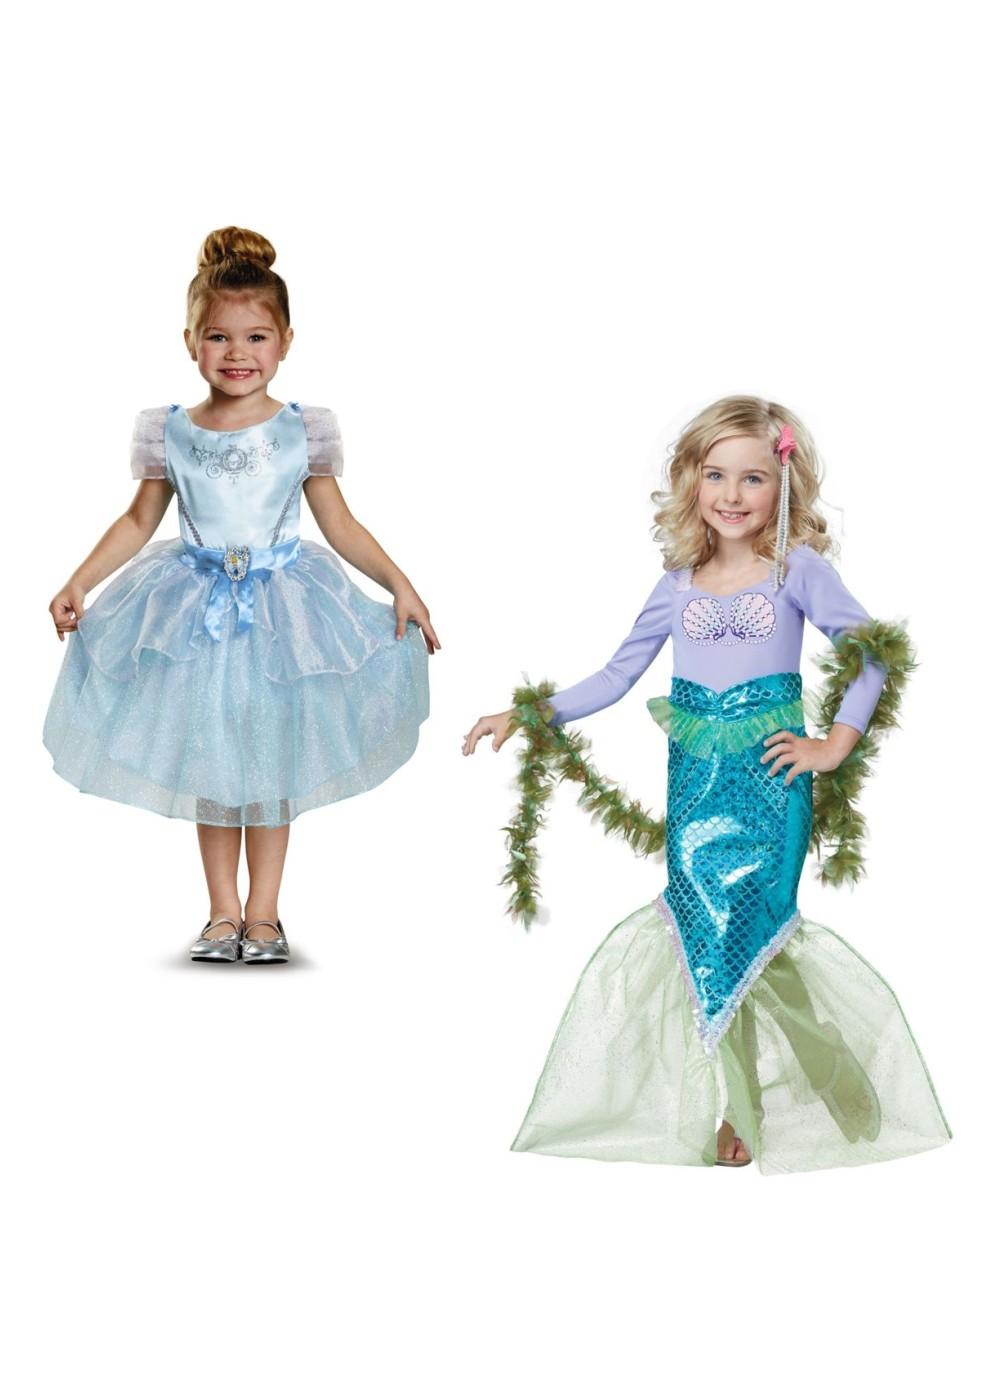 Cinderella Costume and Magical Mermaid Girls Costumes Set  Princess Costumes